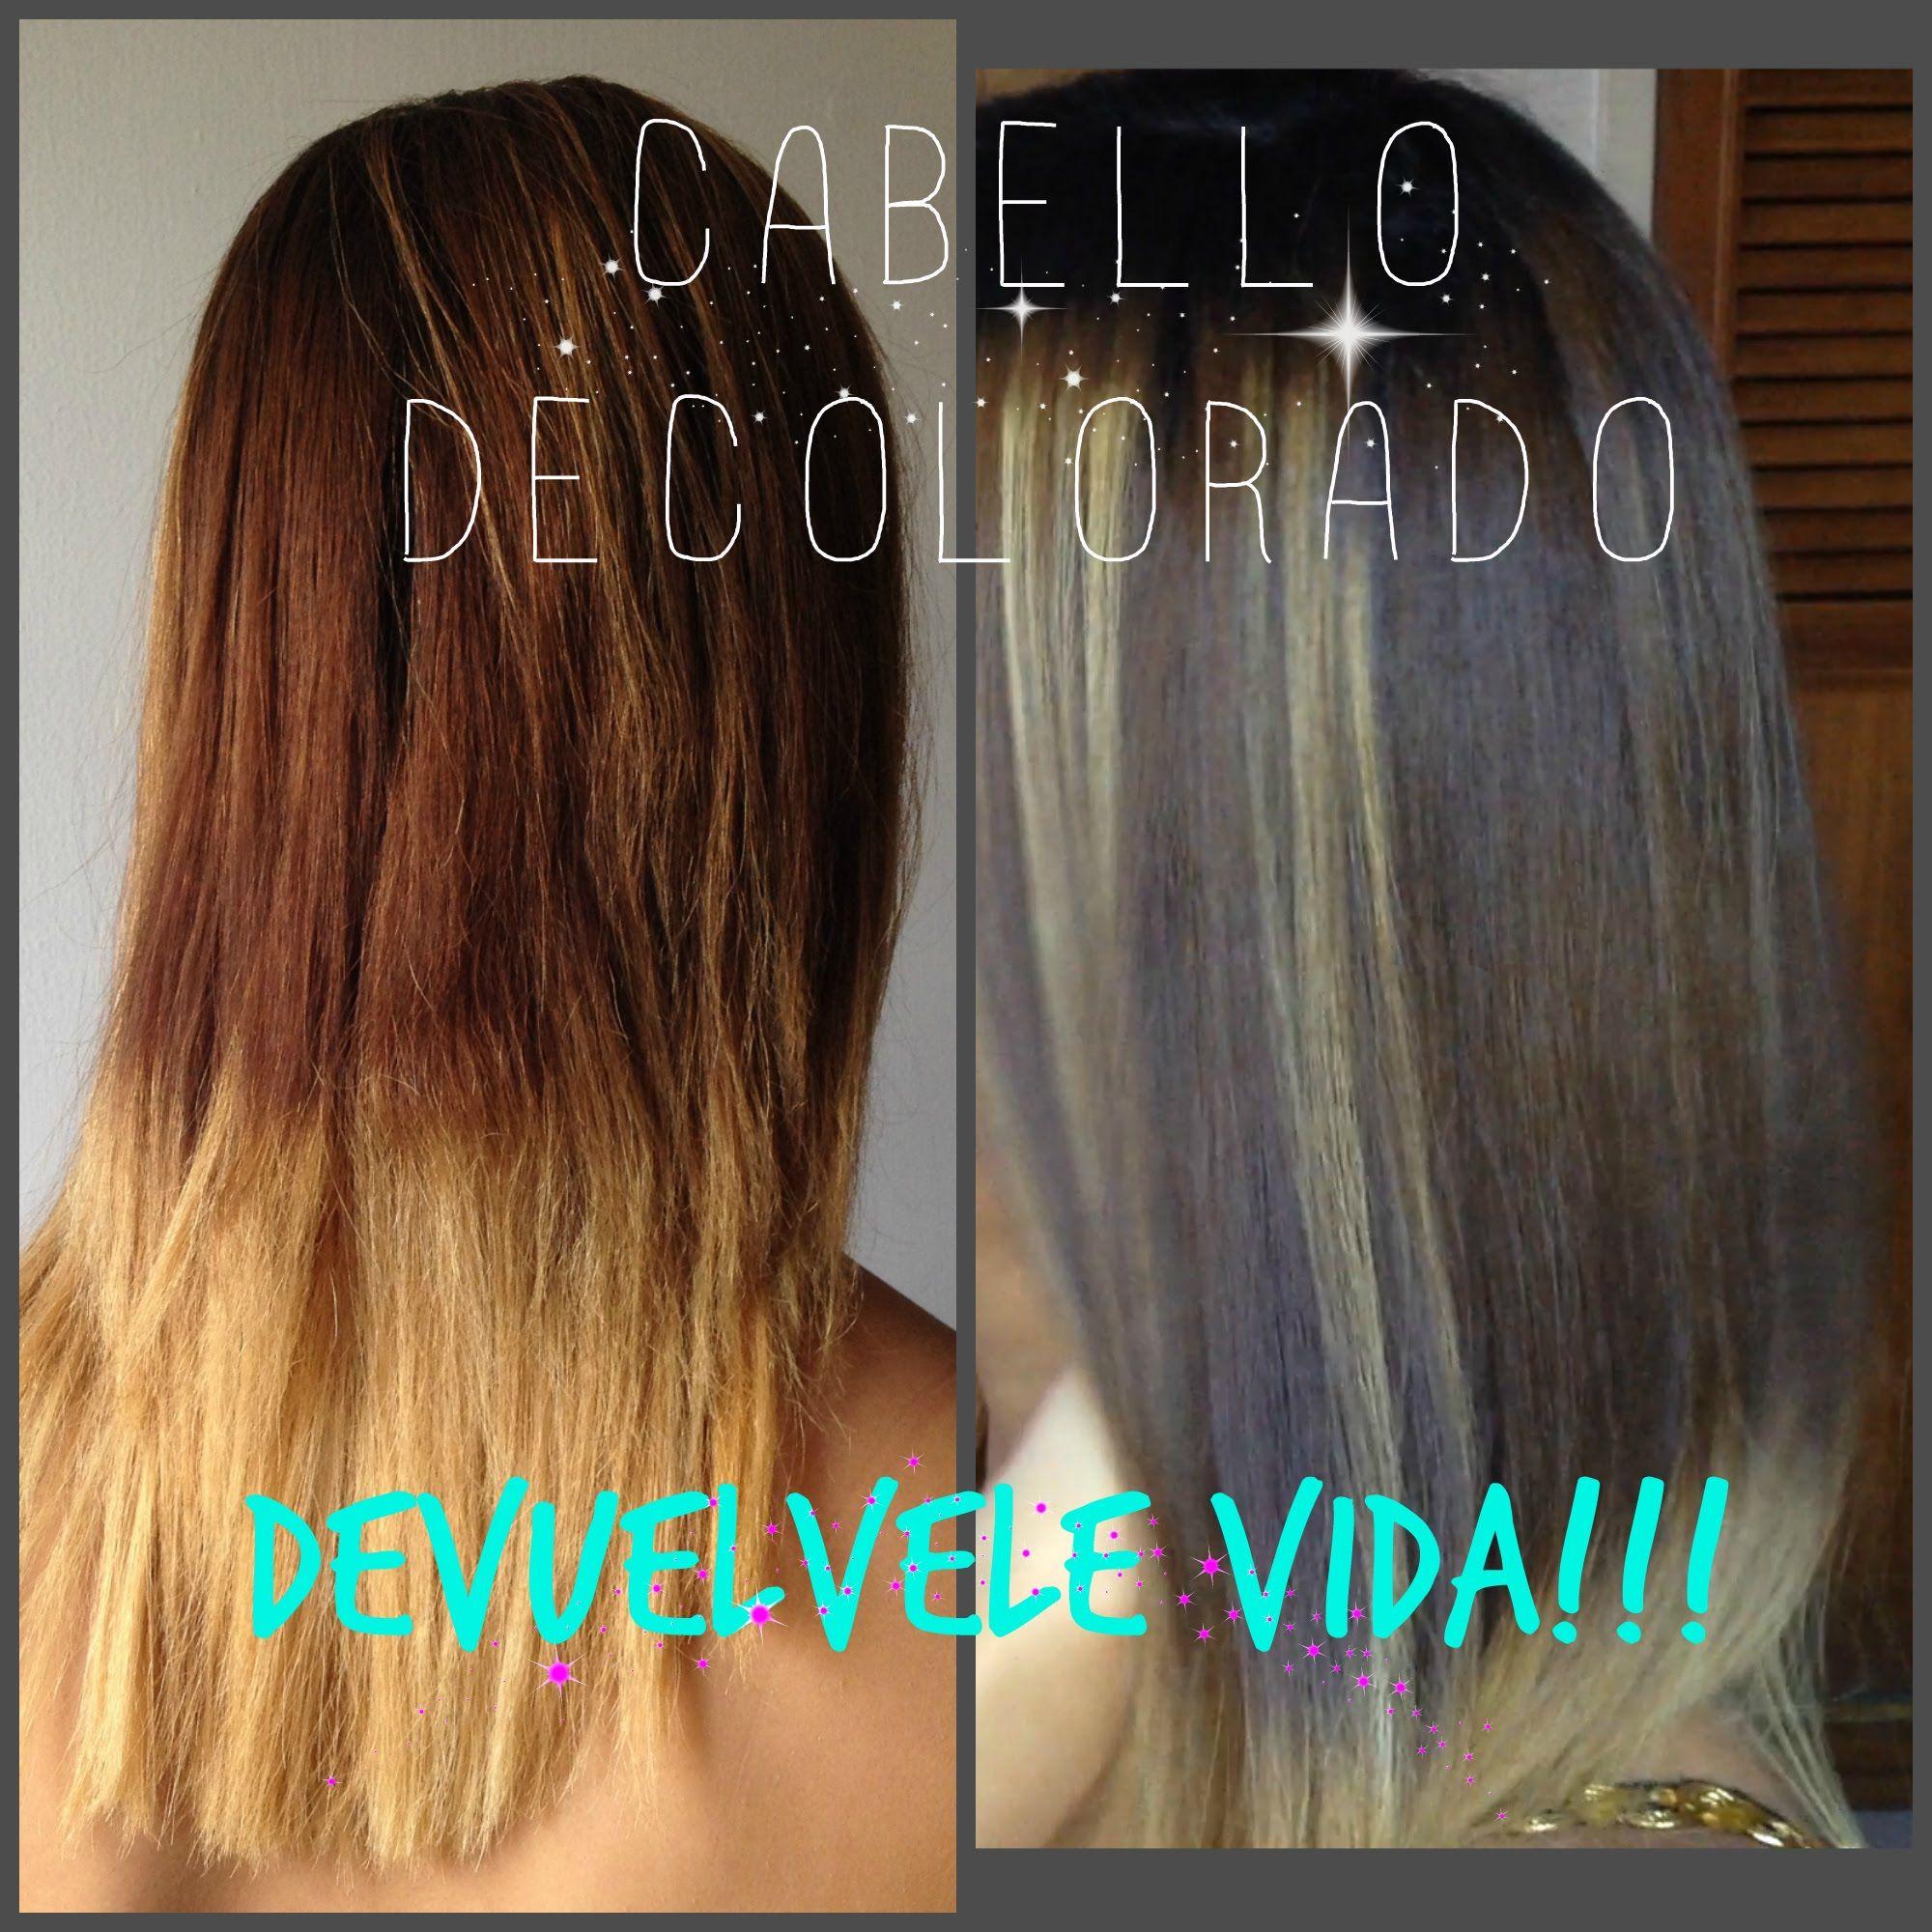 Hidratar cabello decolorado